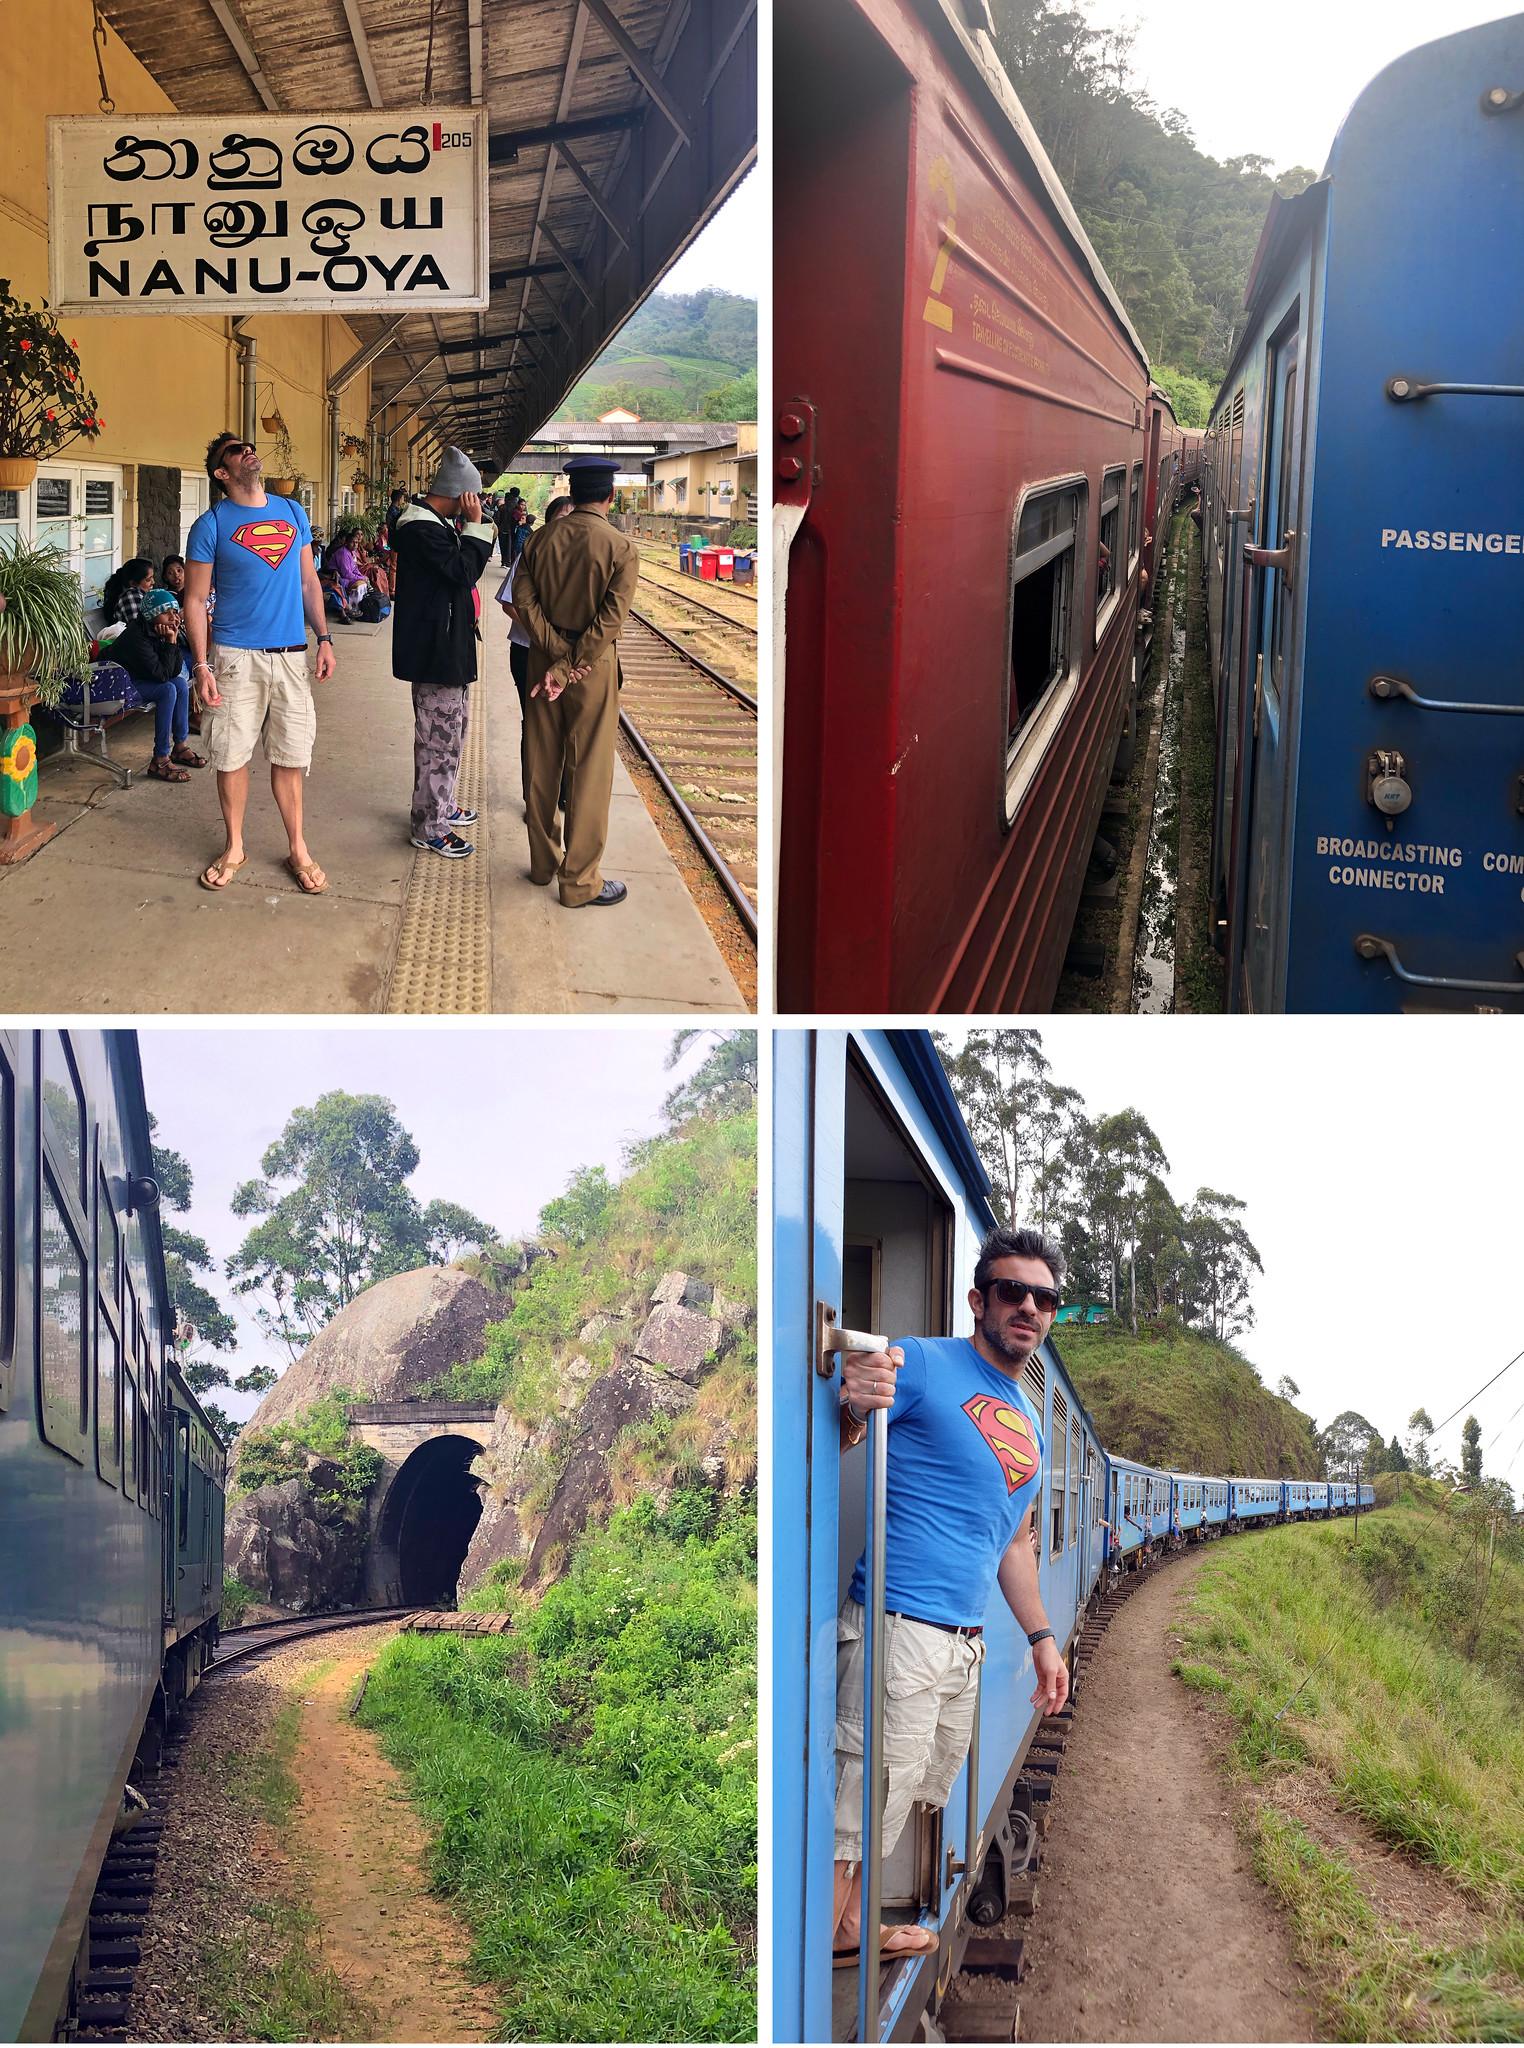 Tren de Ella, Ella Railway - Sri Lanka tren de ella - 46172251284 0d7685fb24 k - Tren de Ella en Sri Lanka: ¿El viaje en tren más pintoresco del mundo?